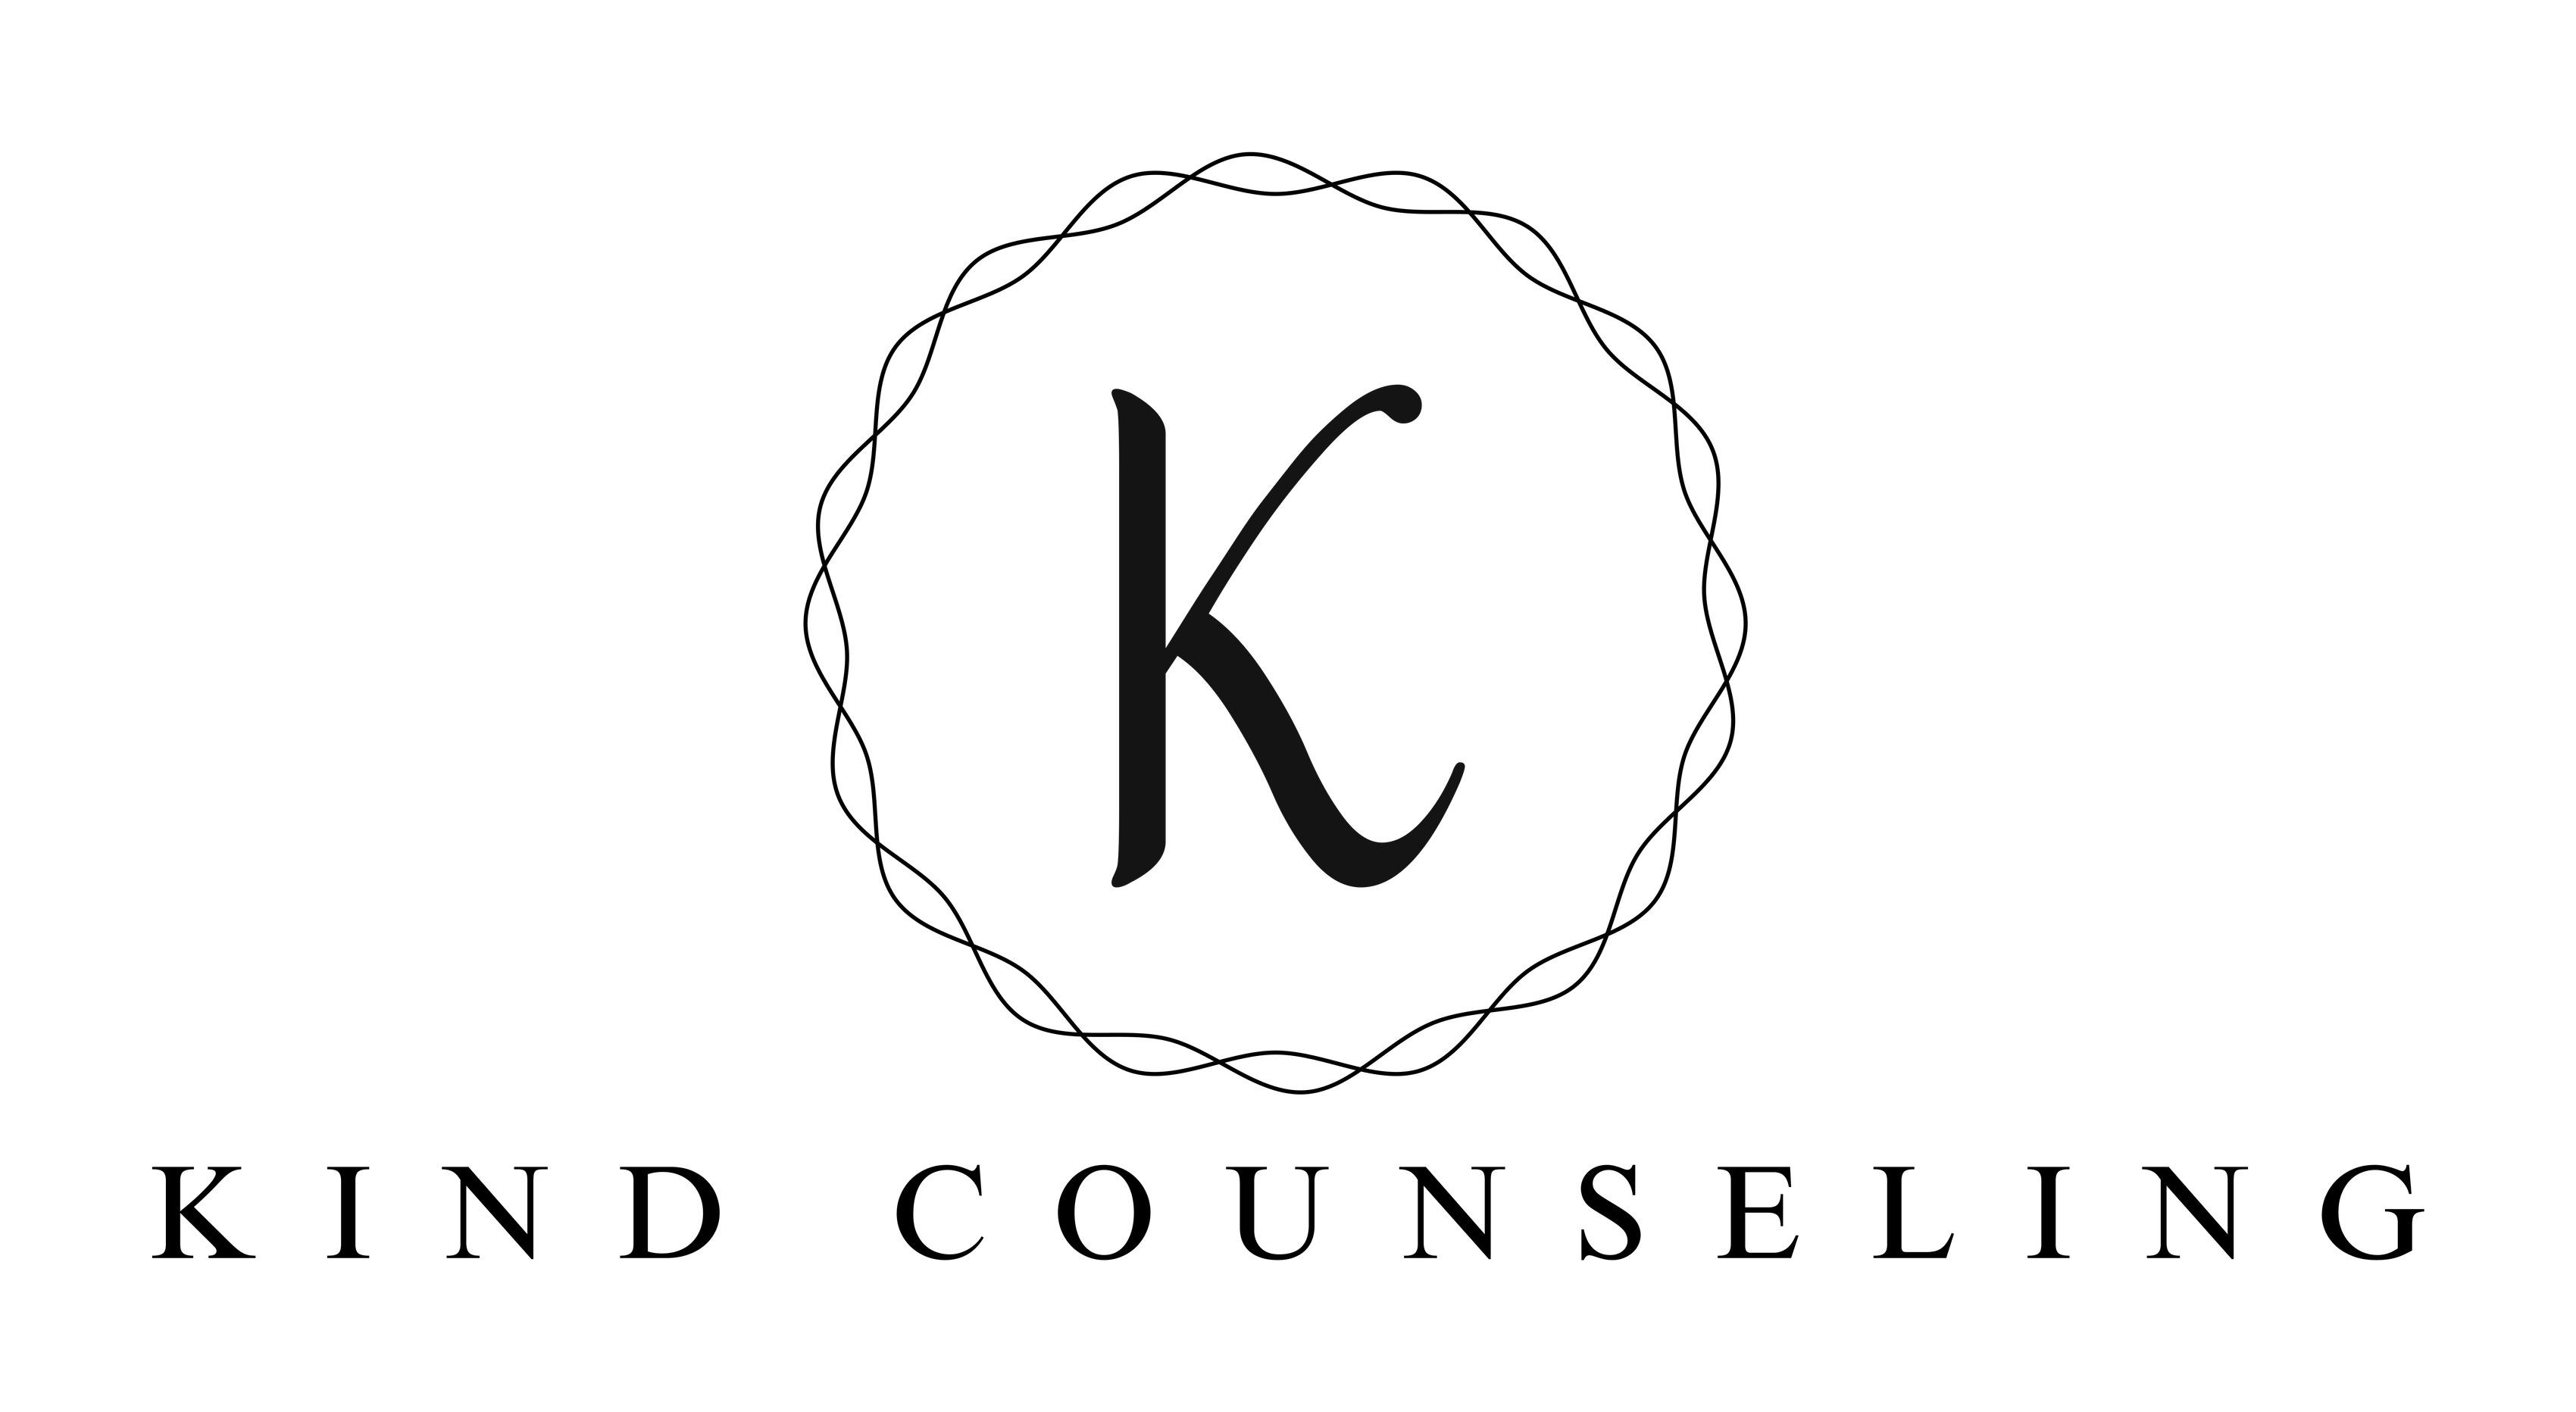 Kind Counseling LLC